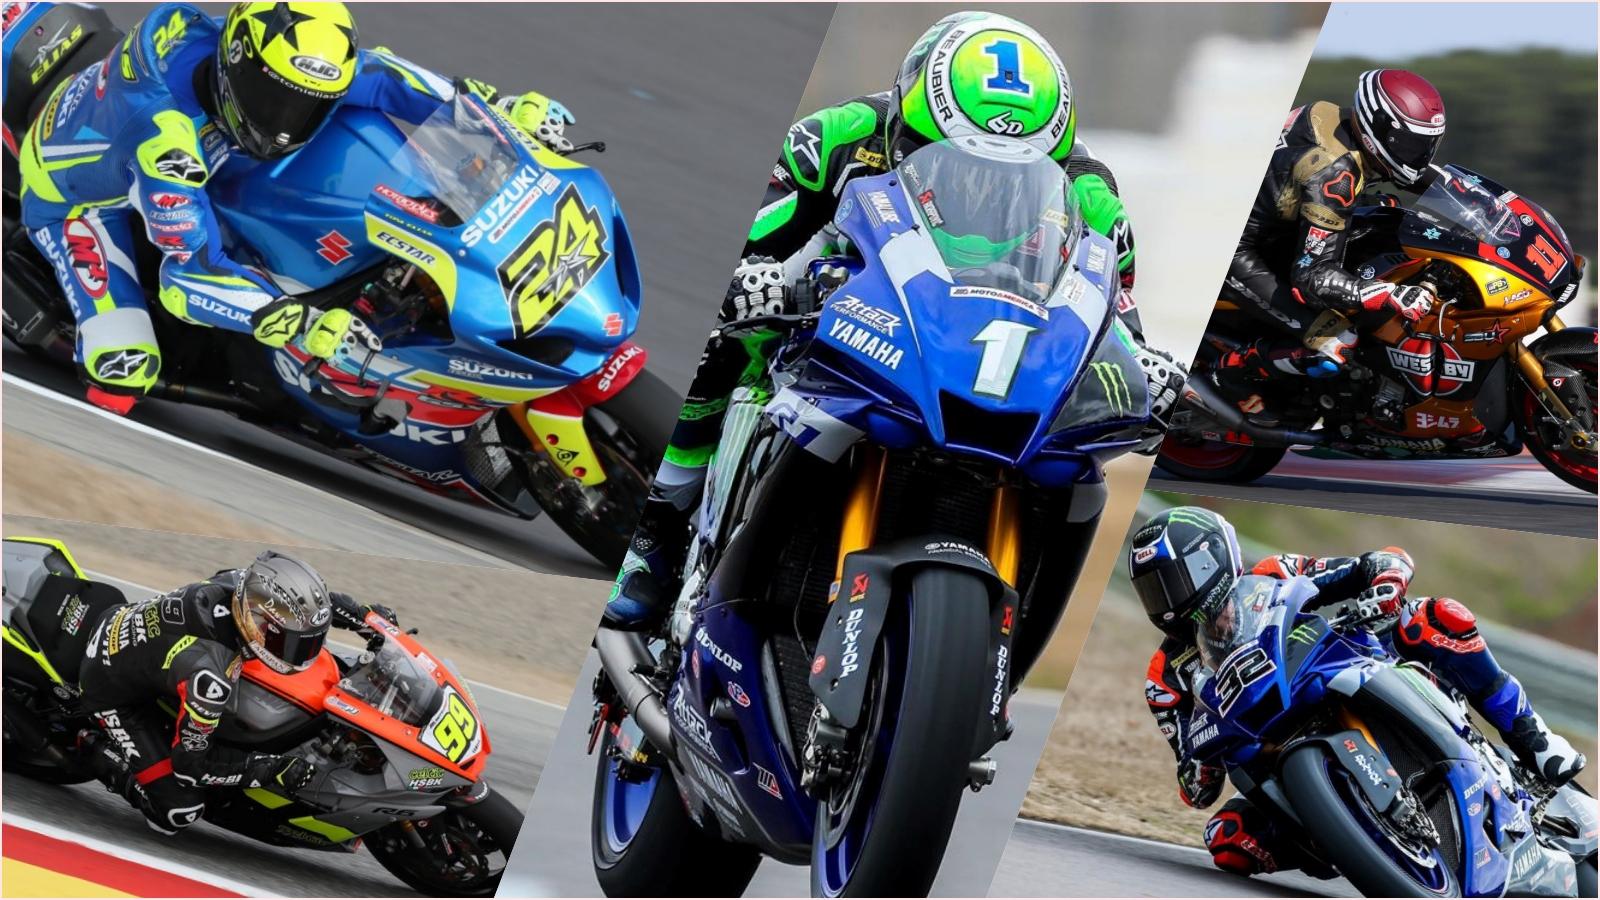 MotoAmerica 2020: pilotos, motos, equipos, calendario, 1 español y cinco favoritos